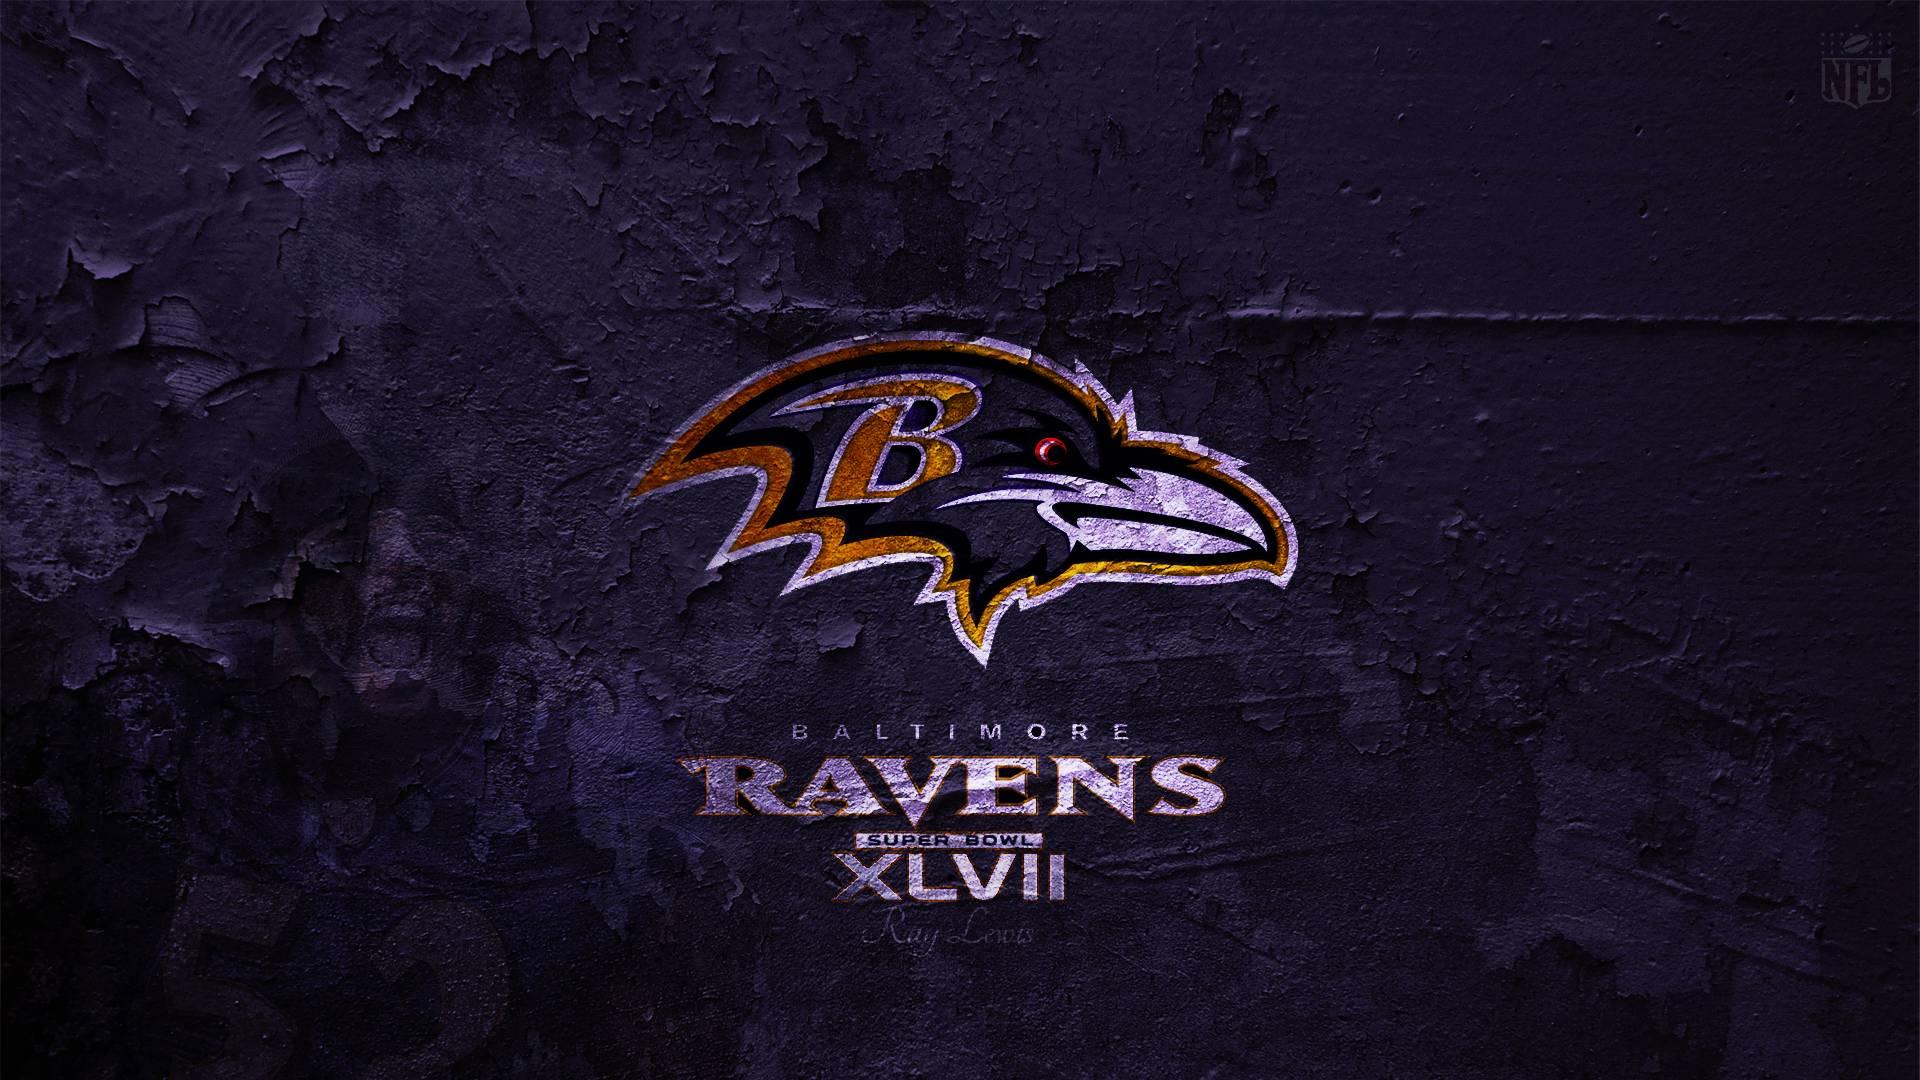 baltimore ravens wallpaper hd  Baltimore Ravens Wallpapers - Wallpaper Cave